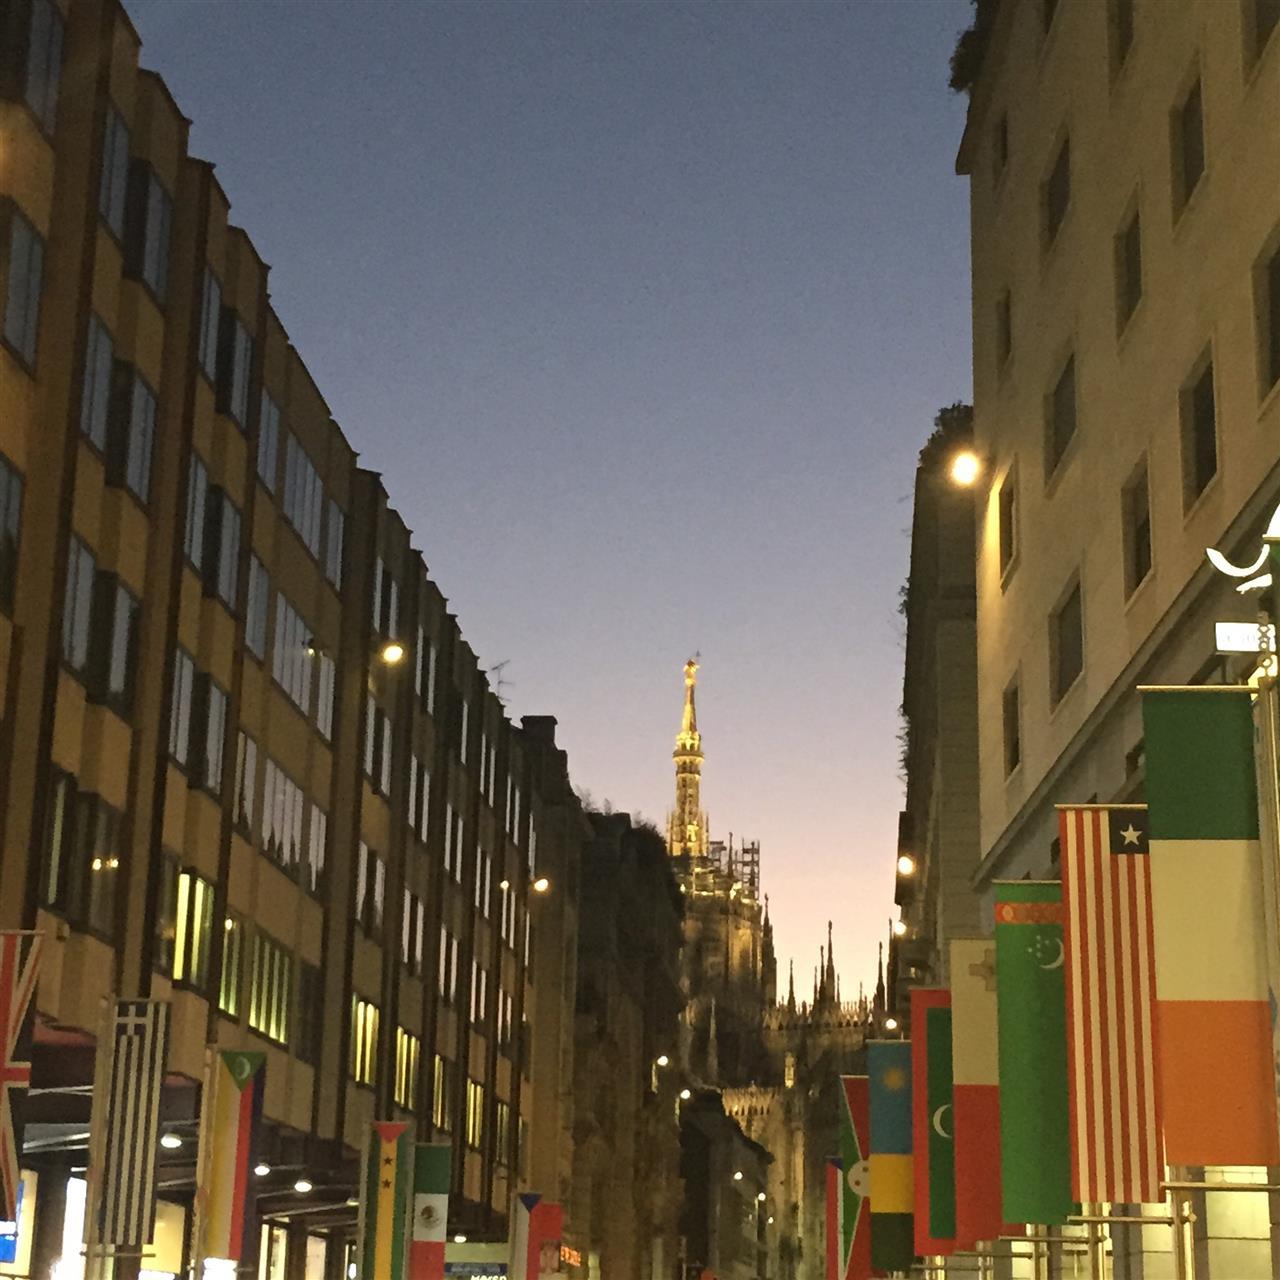 Corso Vittorio Emanuele #shopping street #Milano